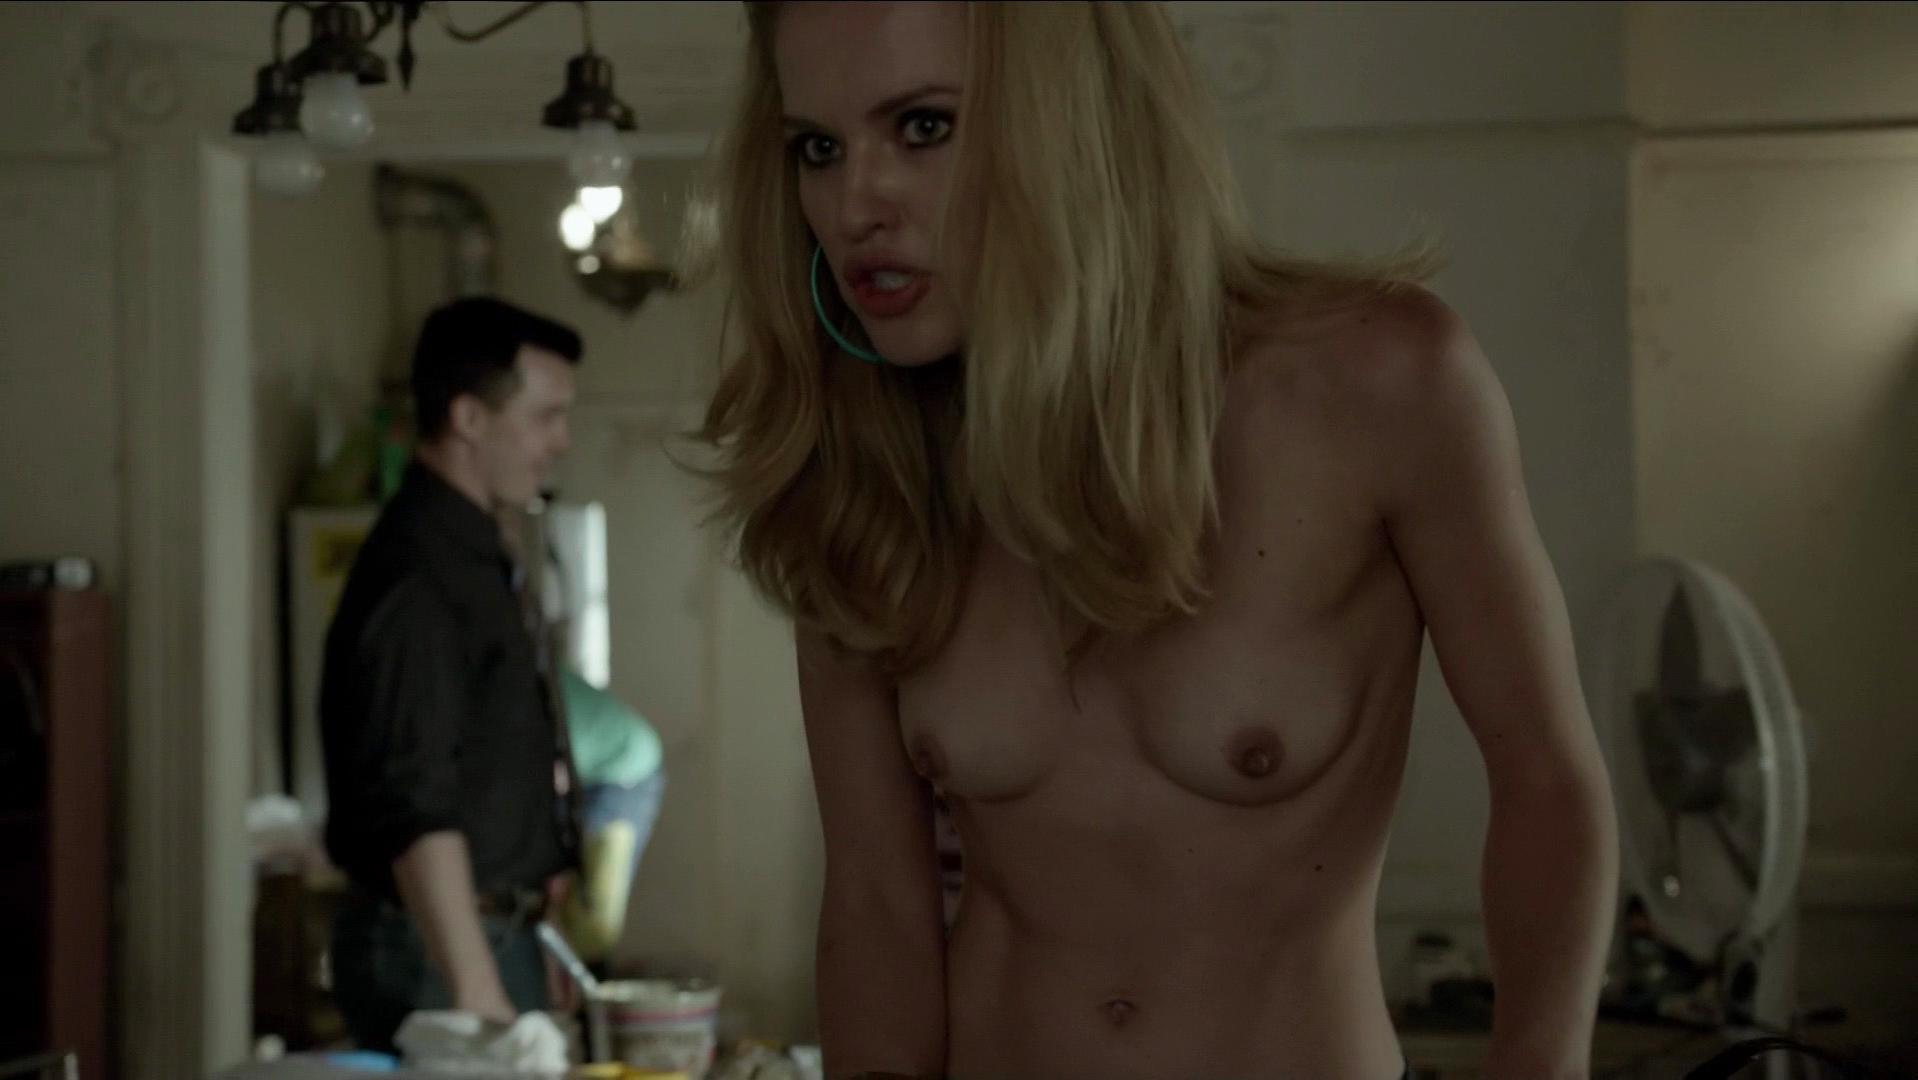 Ileana Huxleys nude, Emmy Rossum sexy - Shameless s05e01 (2015)